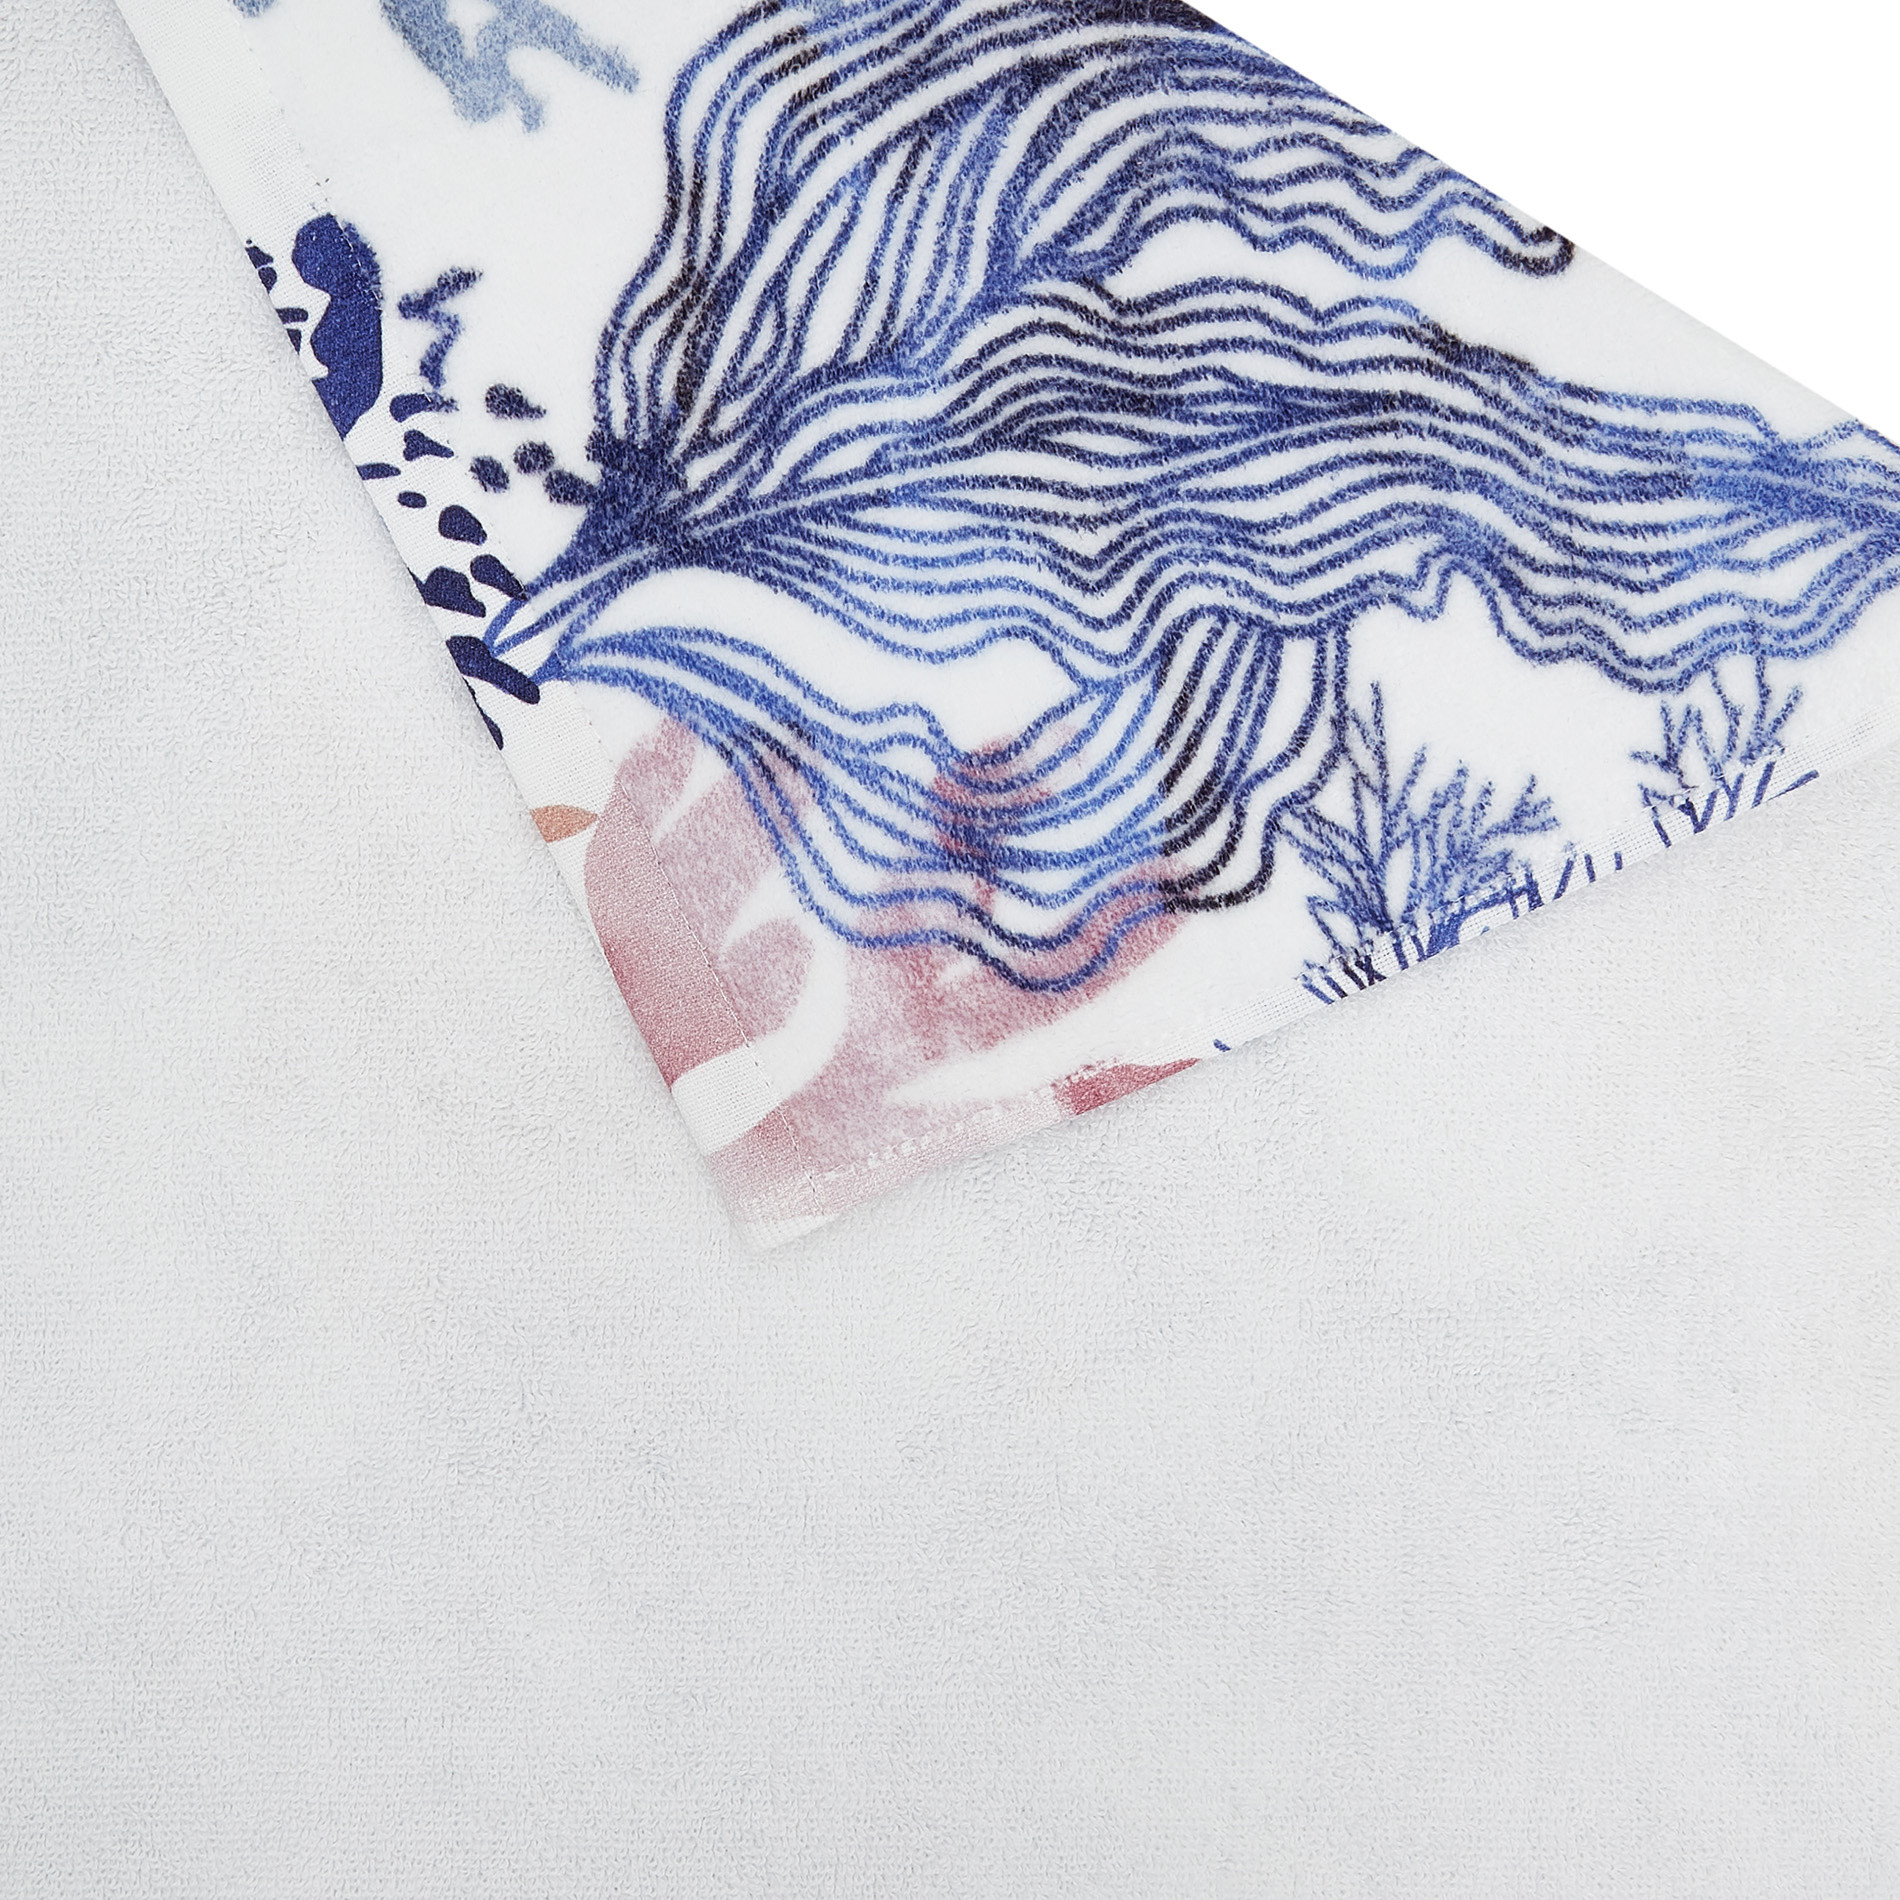 Asciugamano cotone velour stampa coralli, Bianco, large image number 2